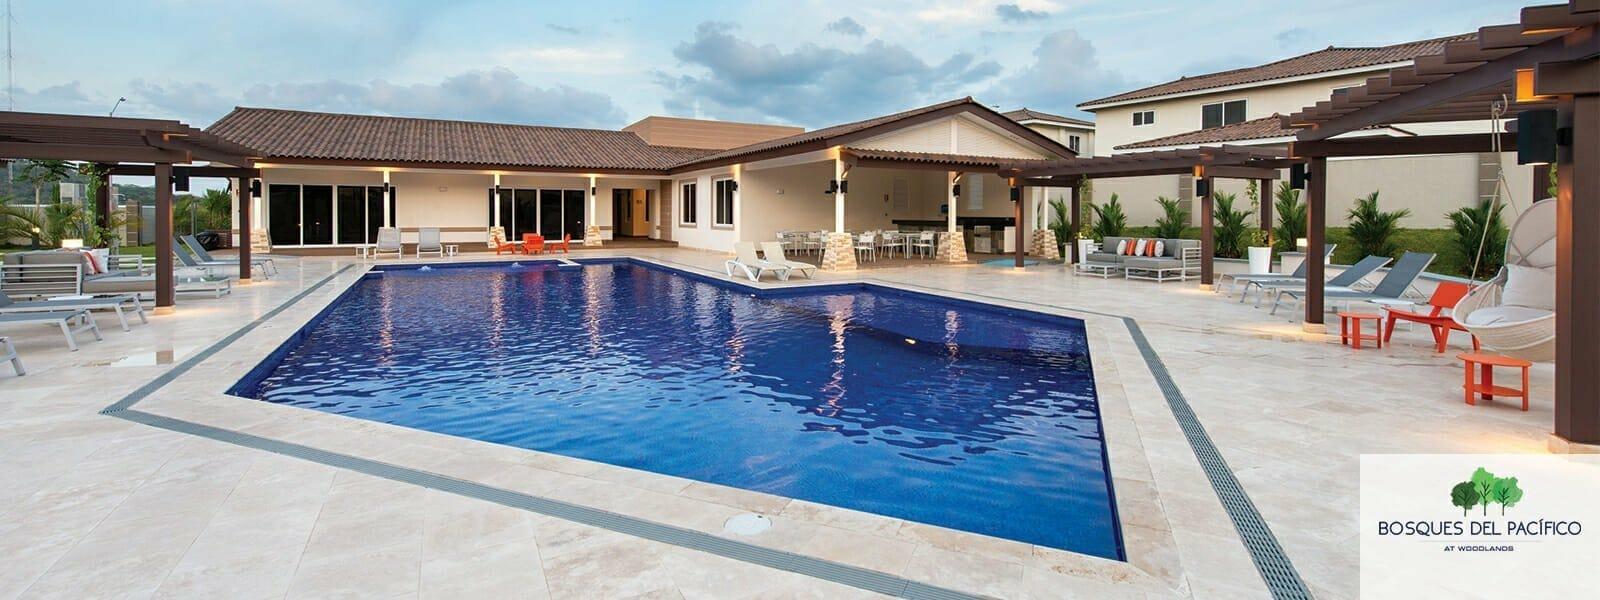 Panama Pacifico | Houses near Panama City Panama | Retire in Panama